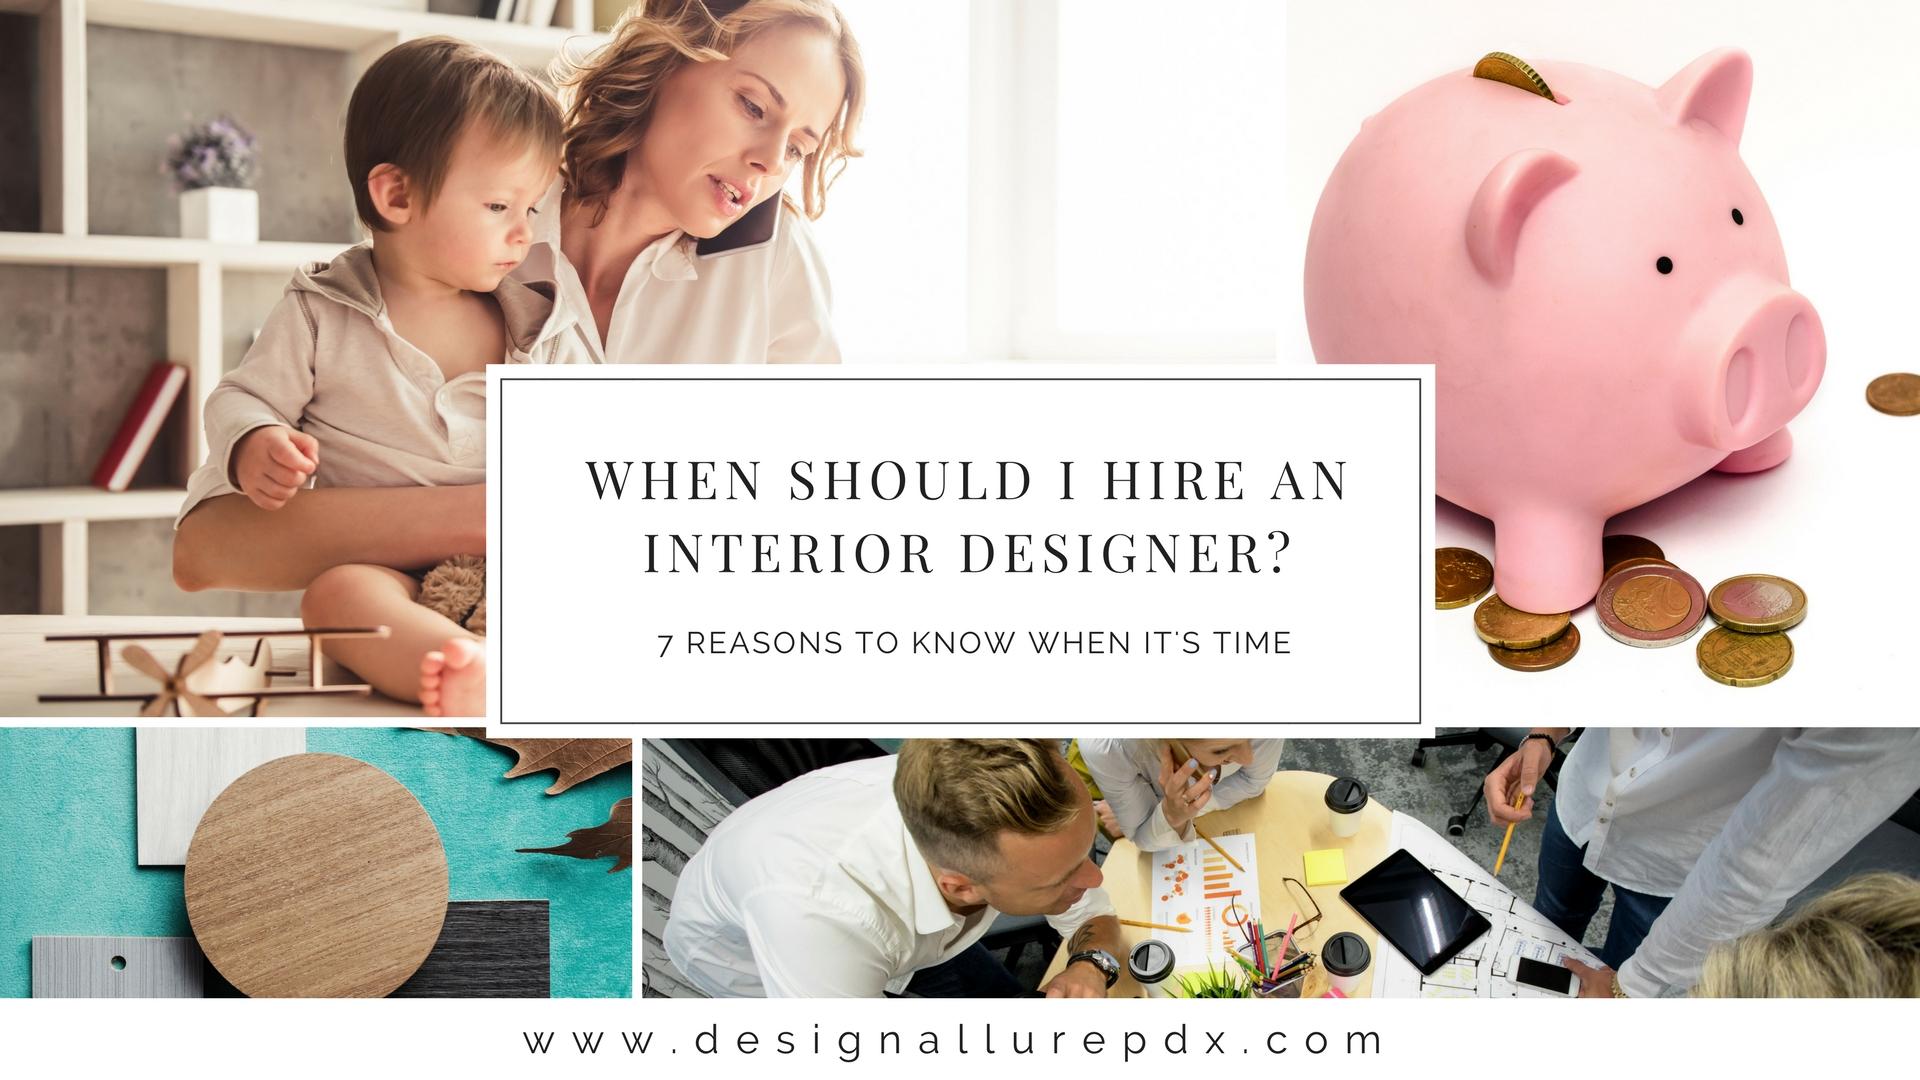 When Should I Hire An Interior Designer